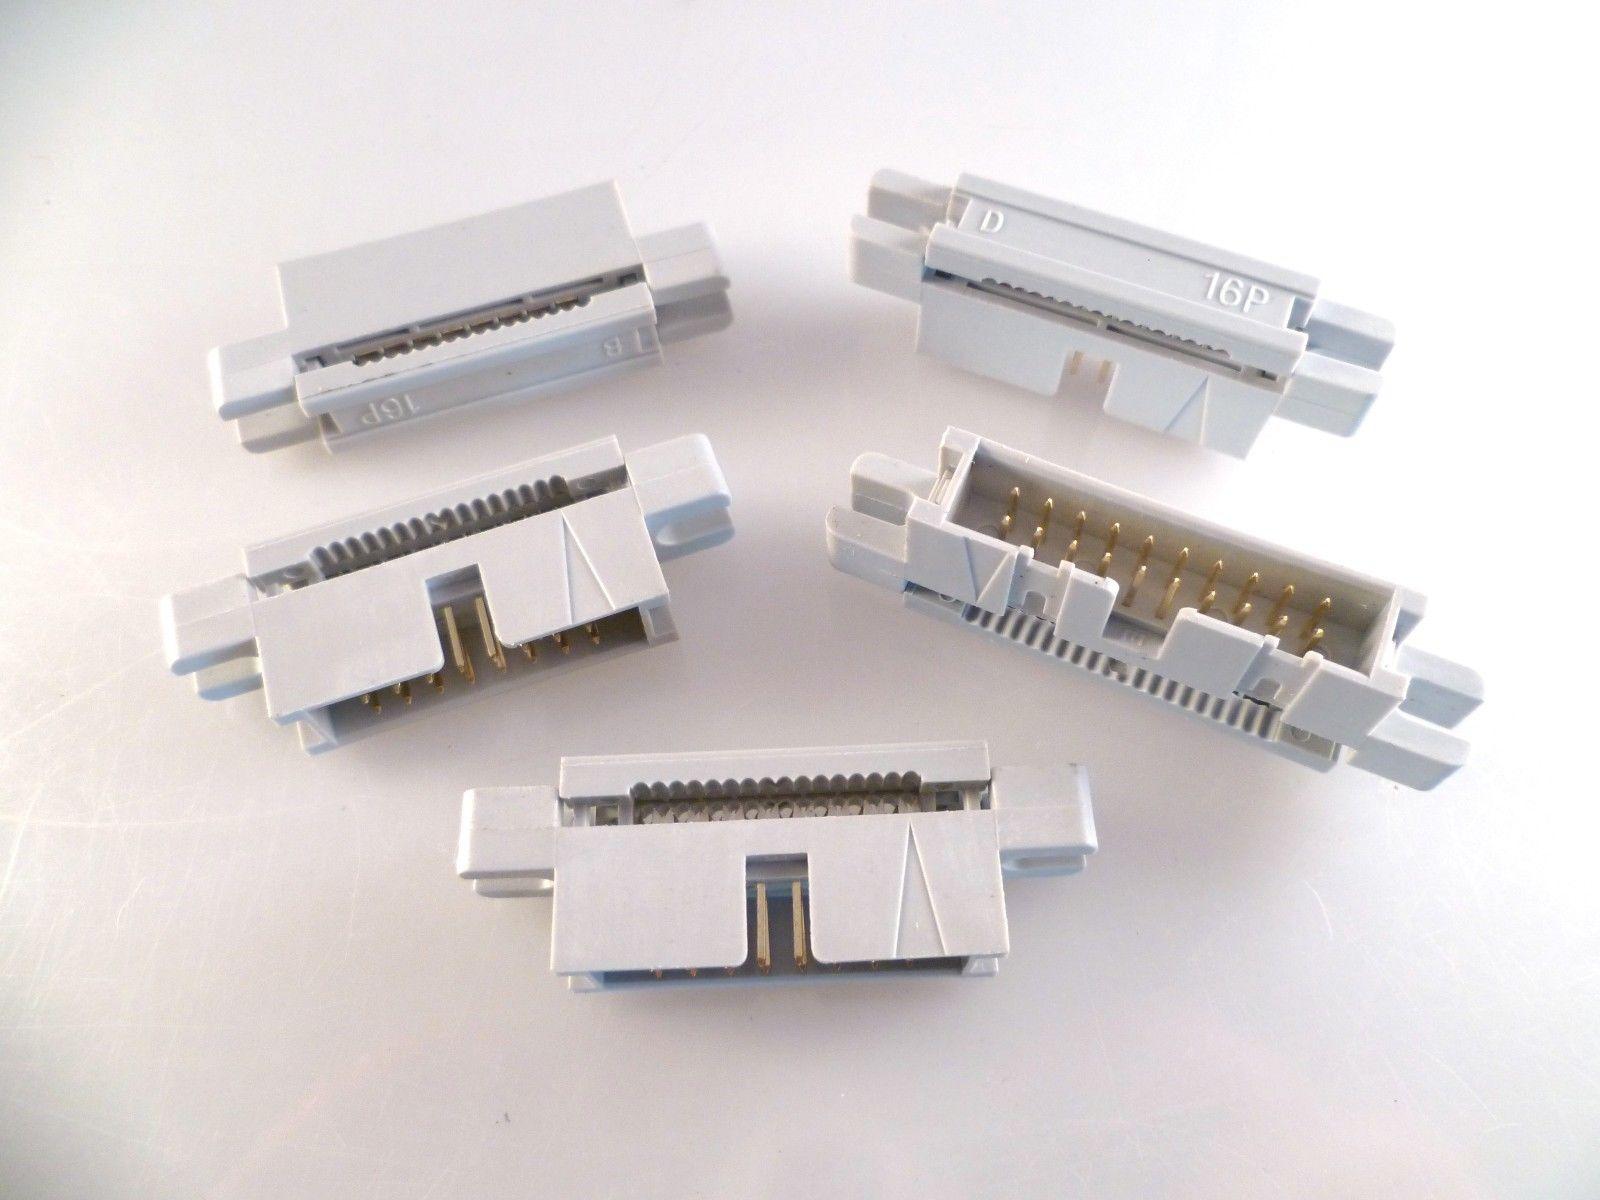 IRWIN HANSON 4935251 Self-Align Hnd Tap,Plug,M11x1.50,Uncoatd